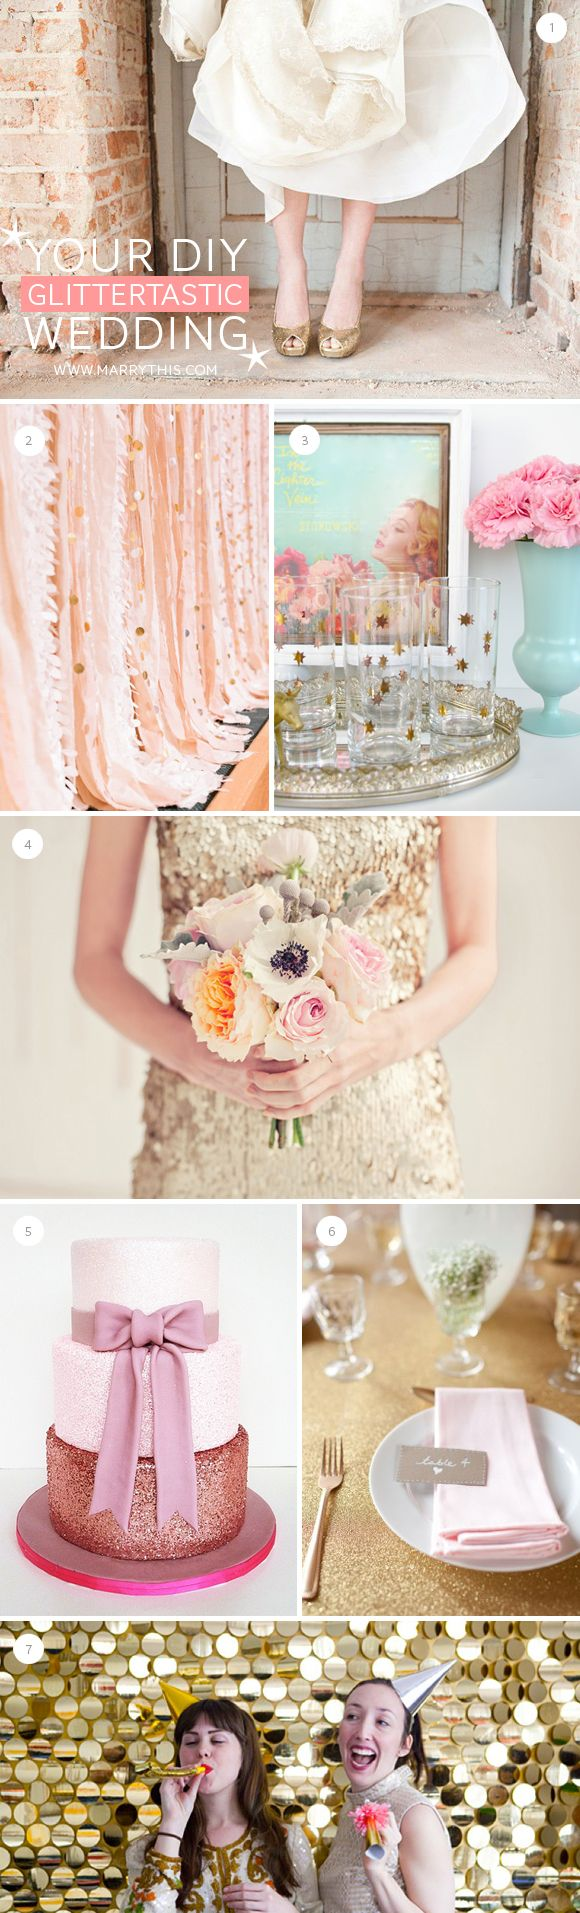 best weddings parties images on pinterest fiesta decorations